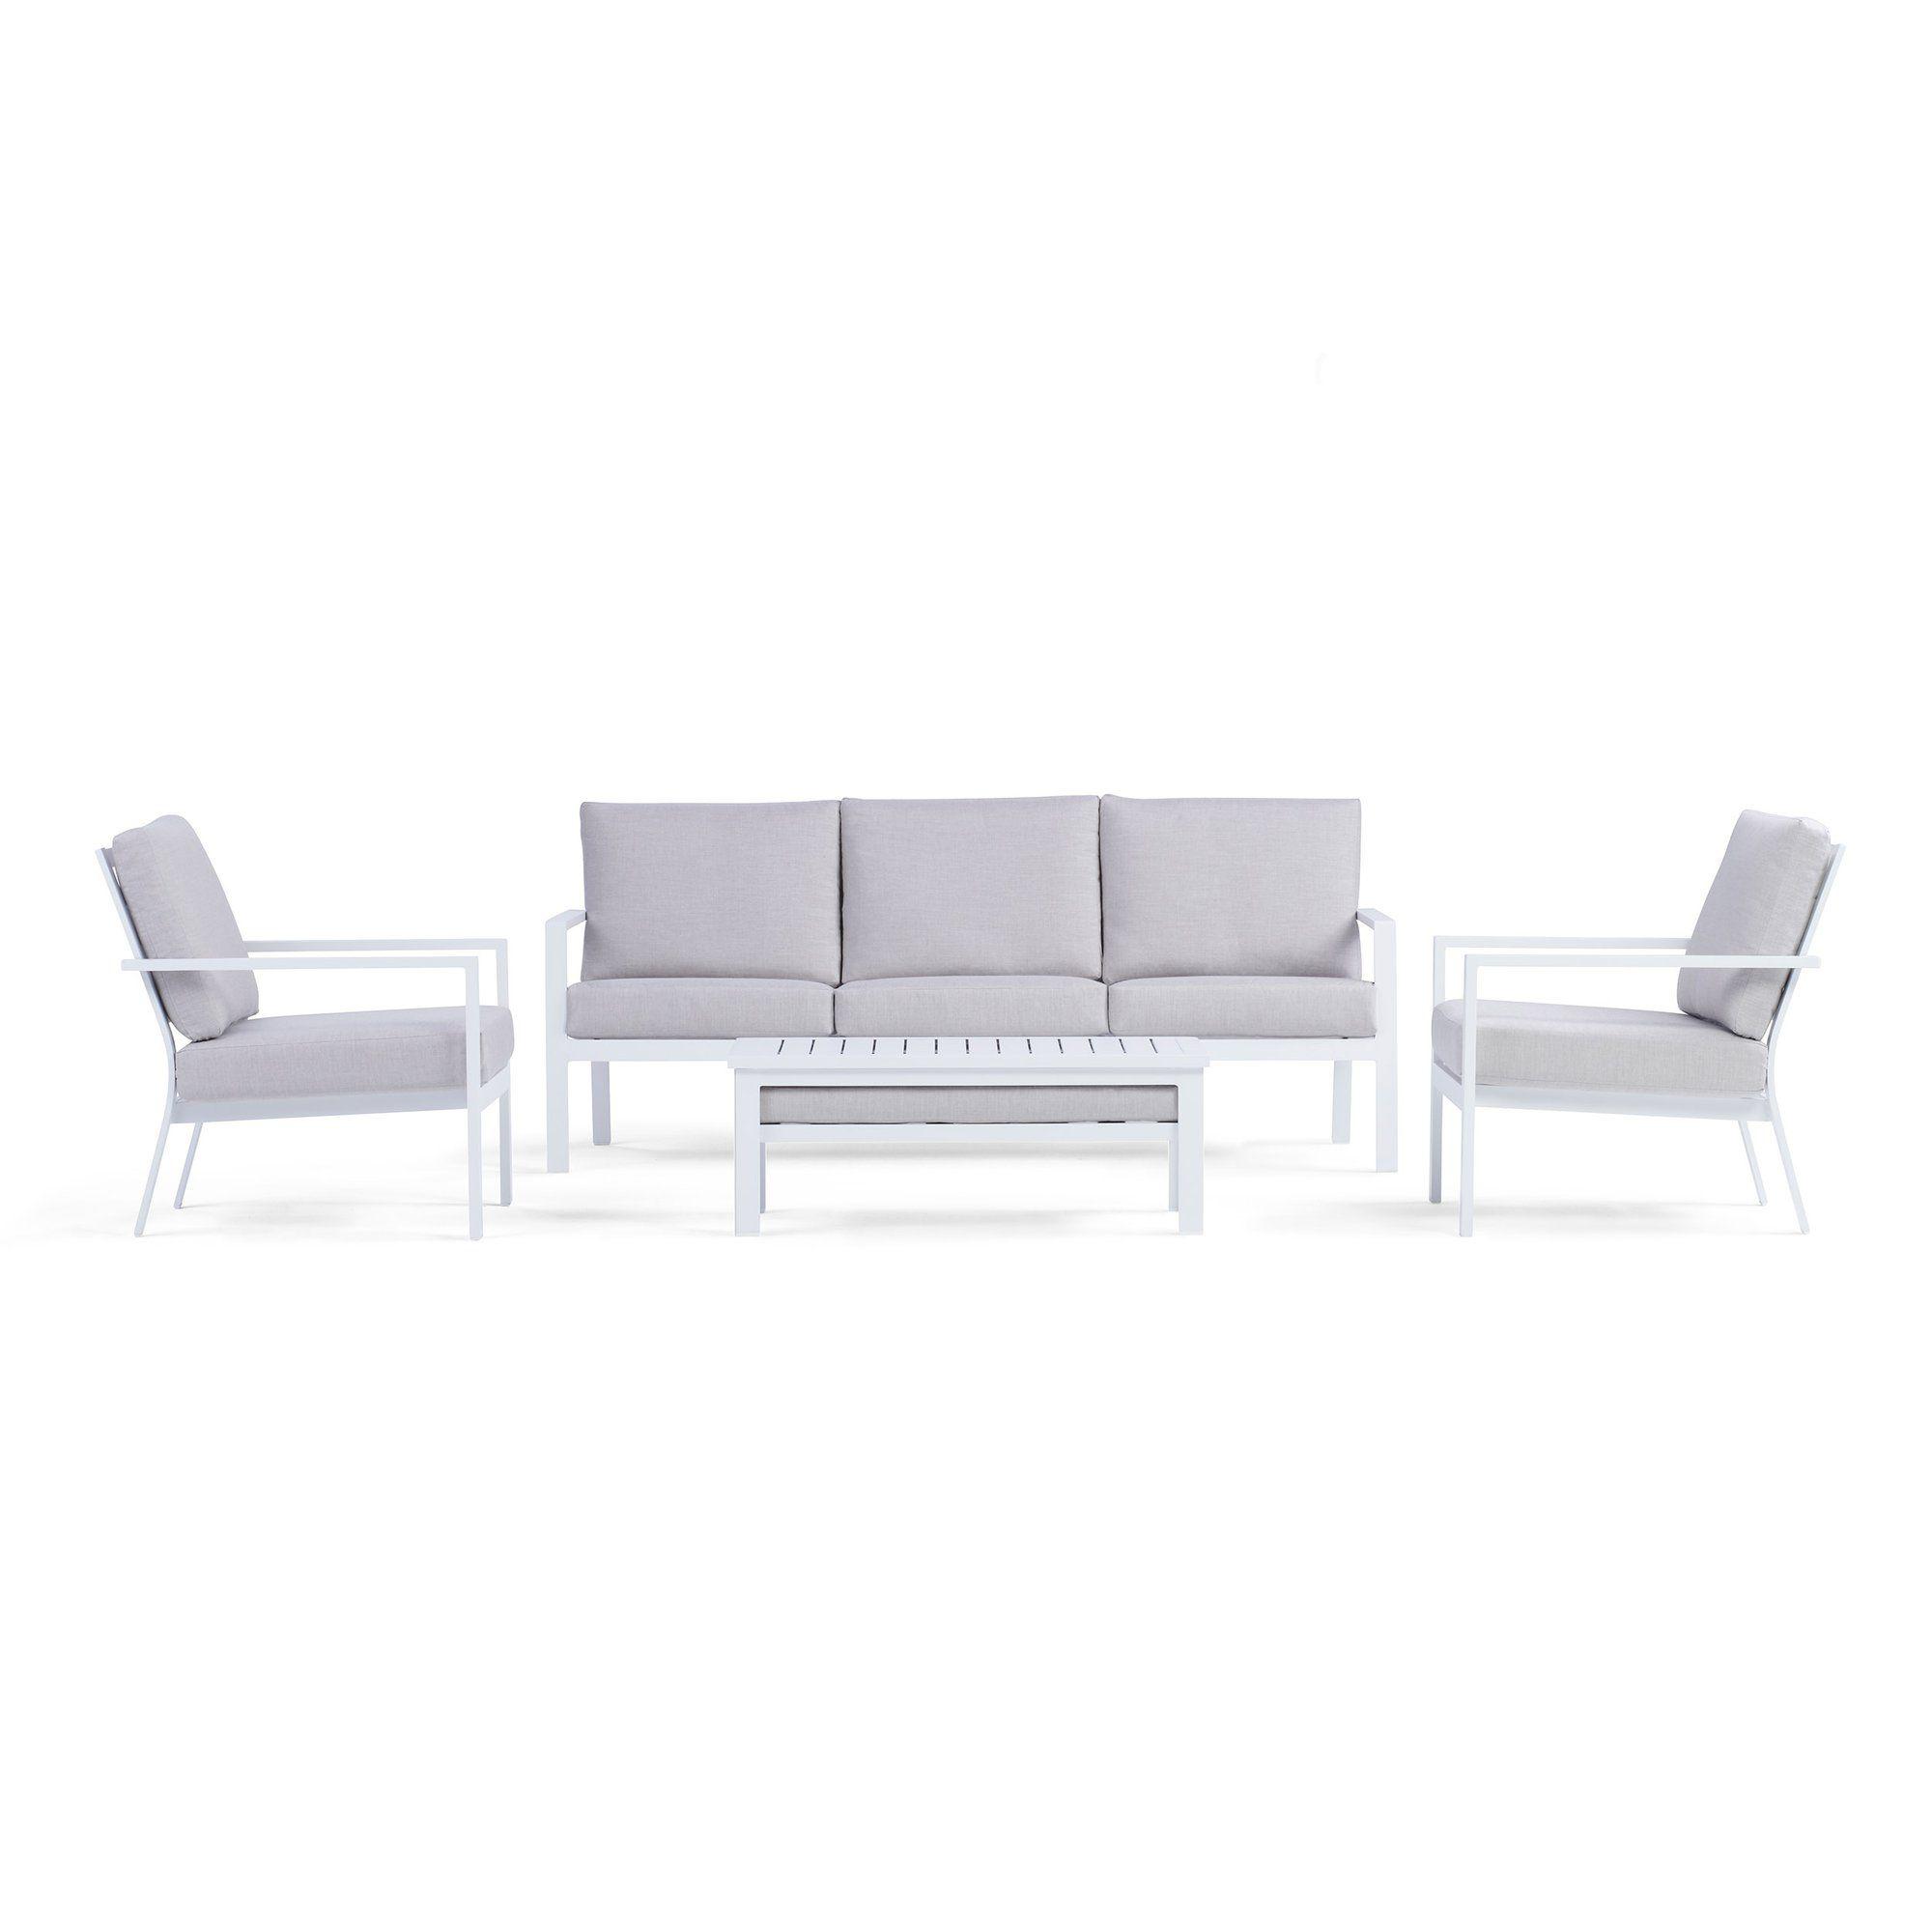 Outdoor conversation set